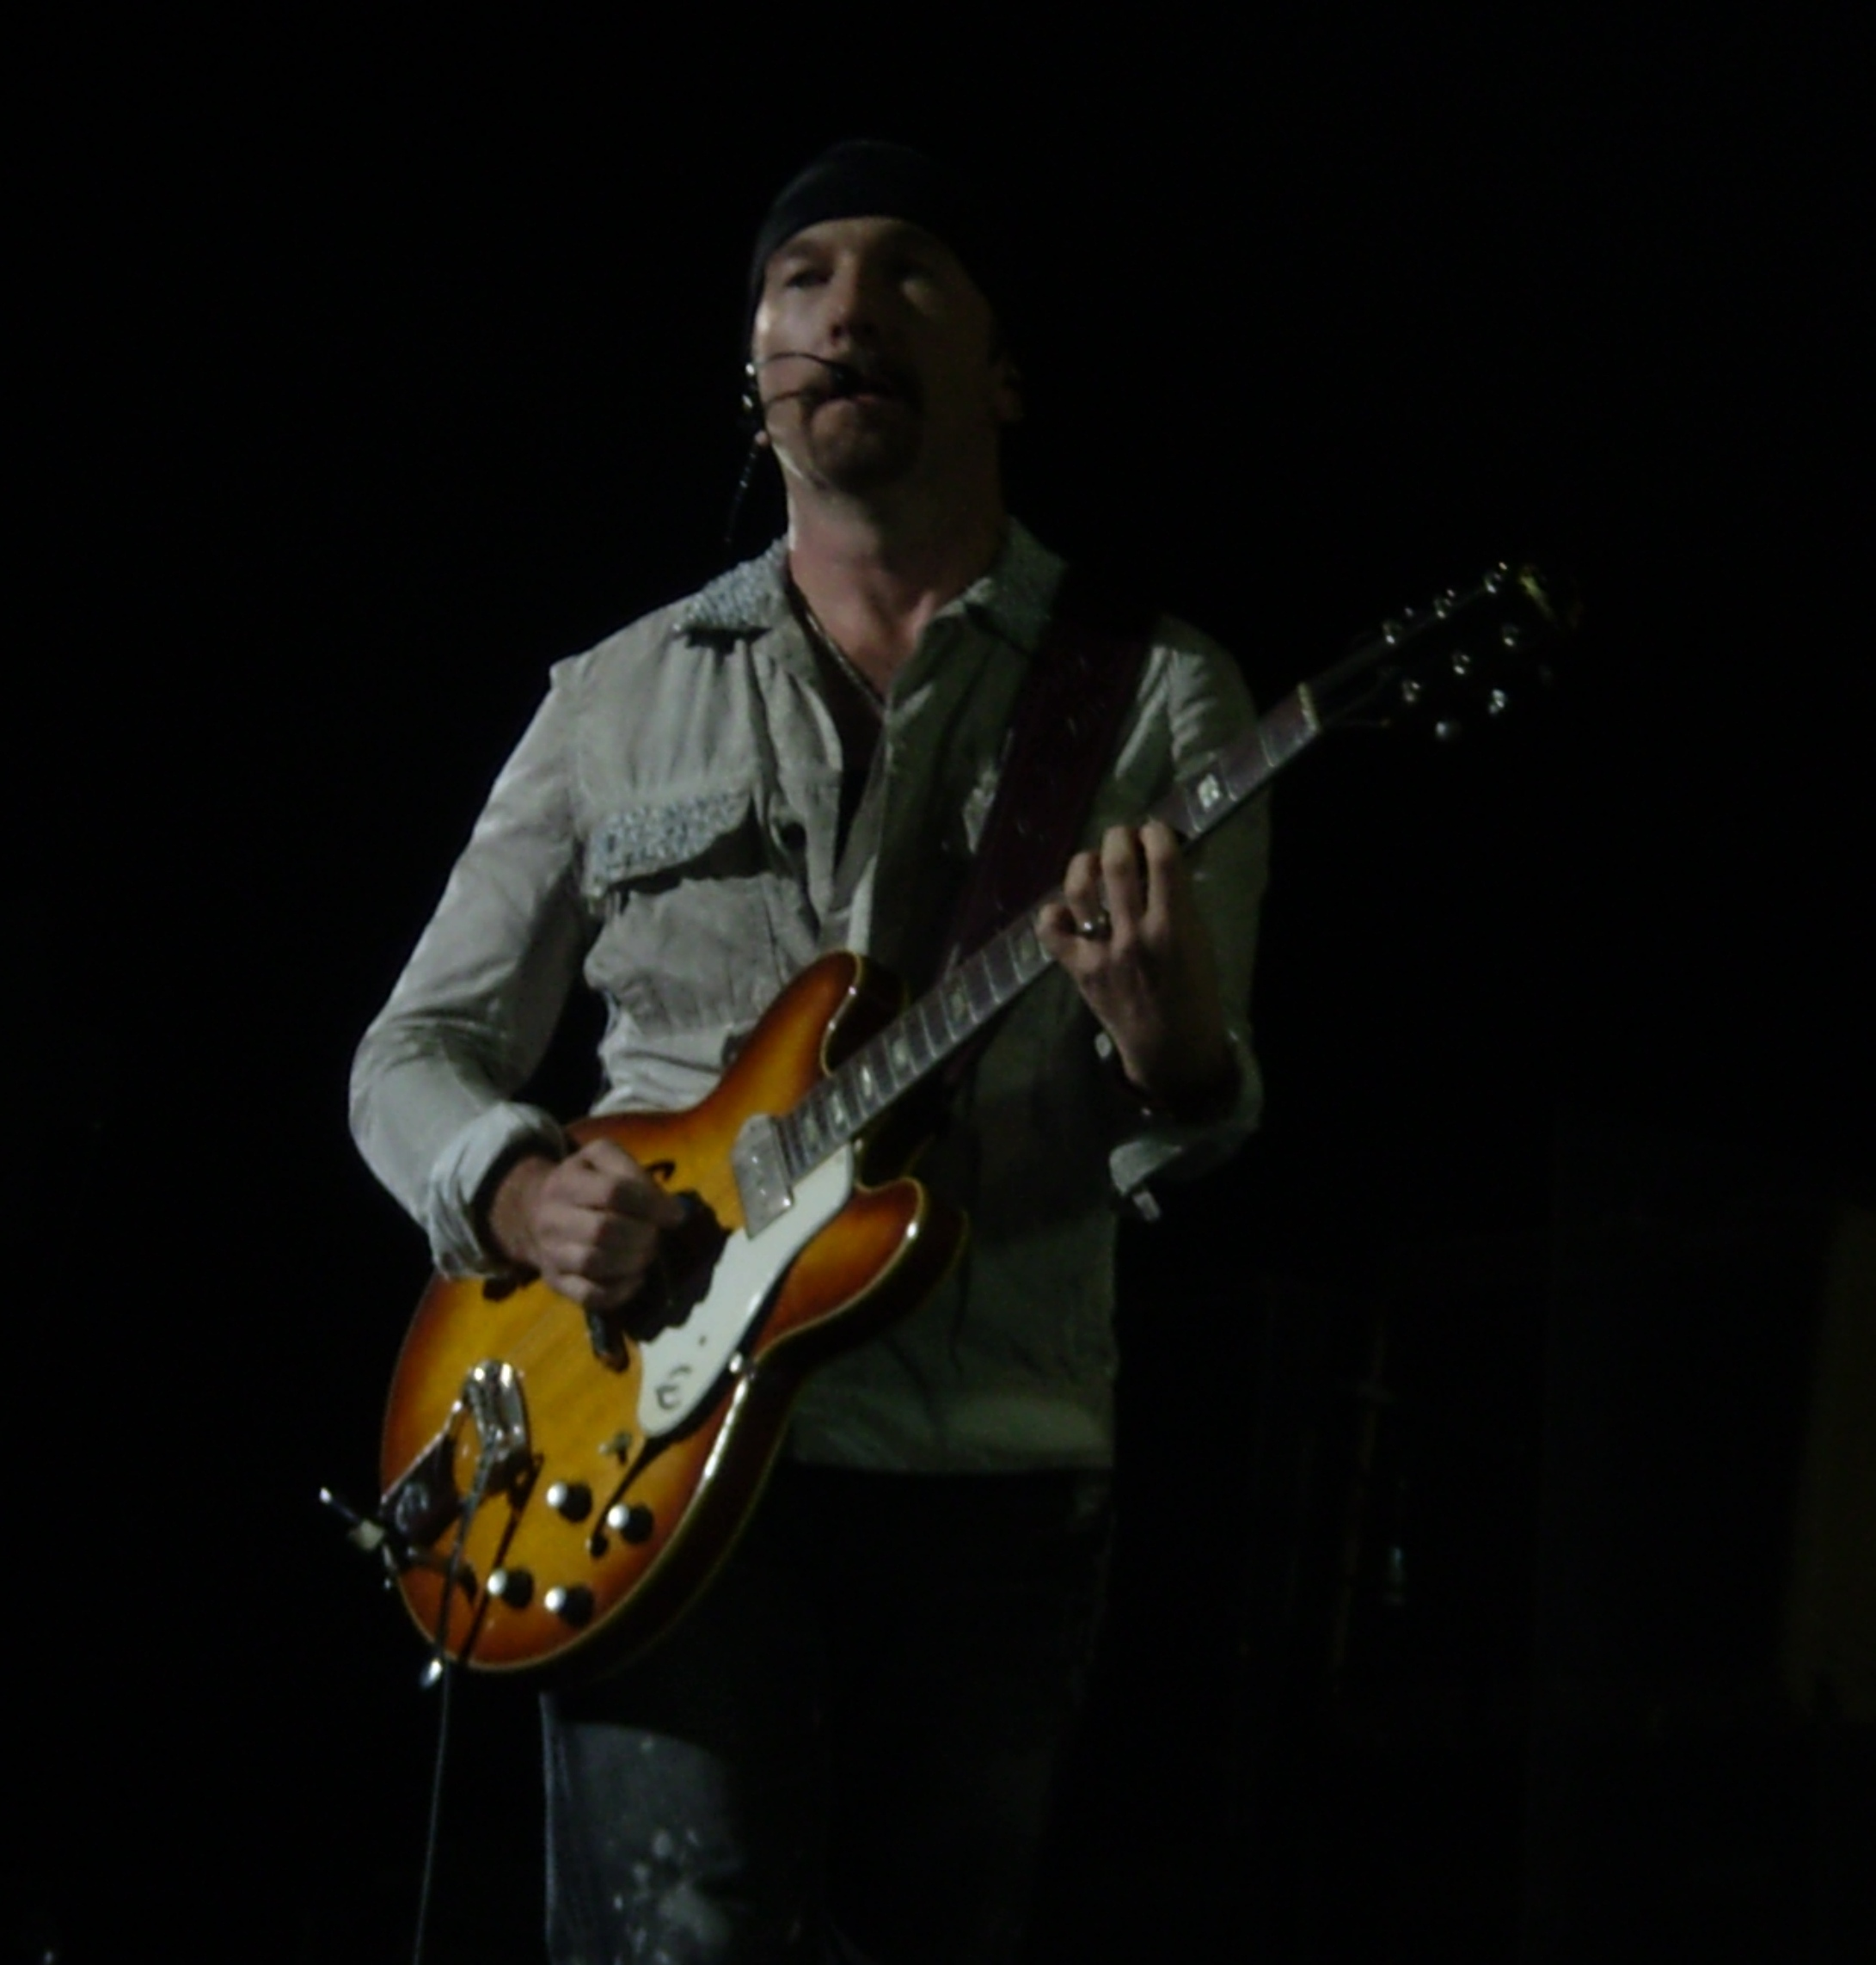 U2's The Edge